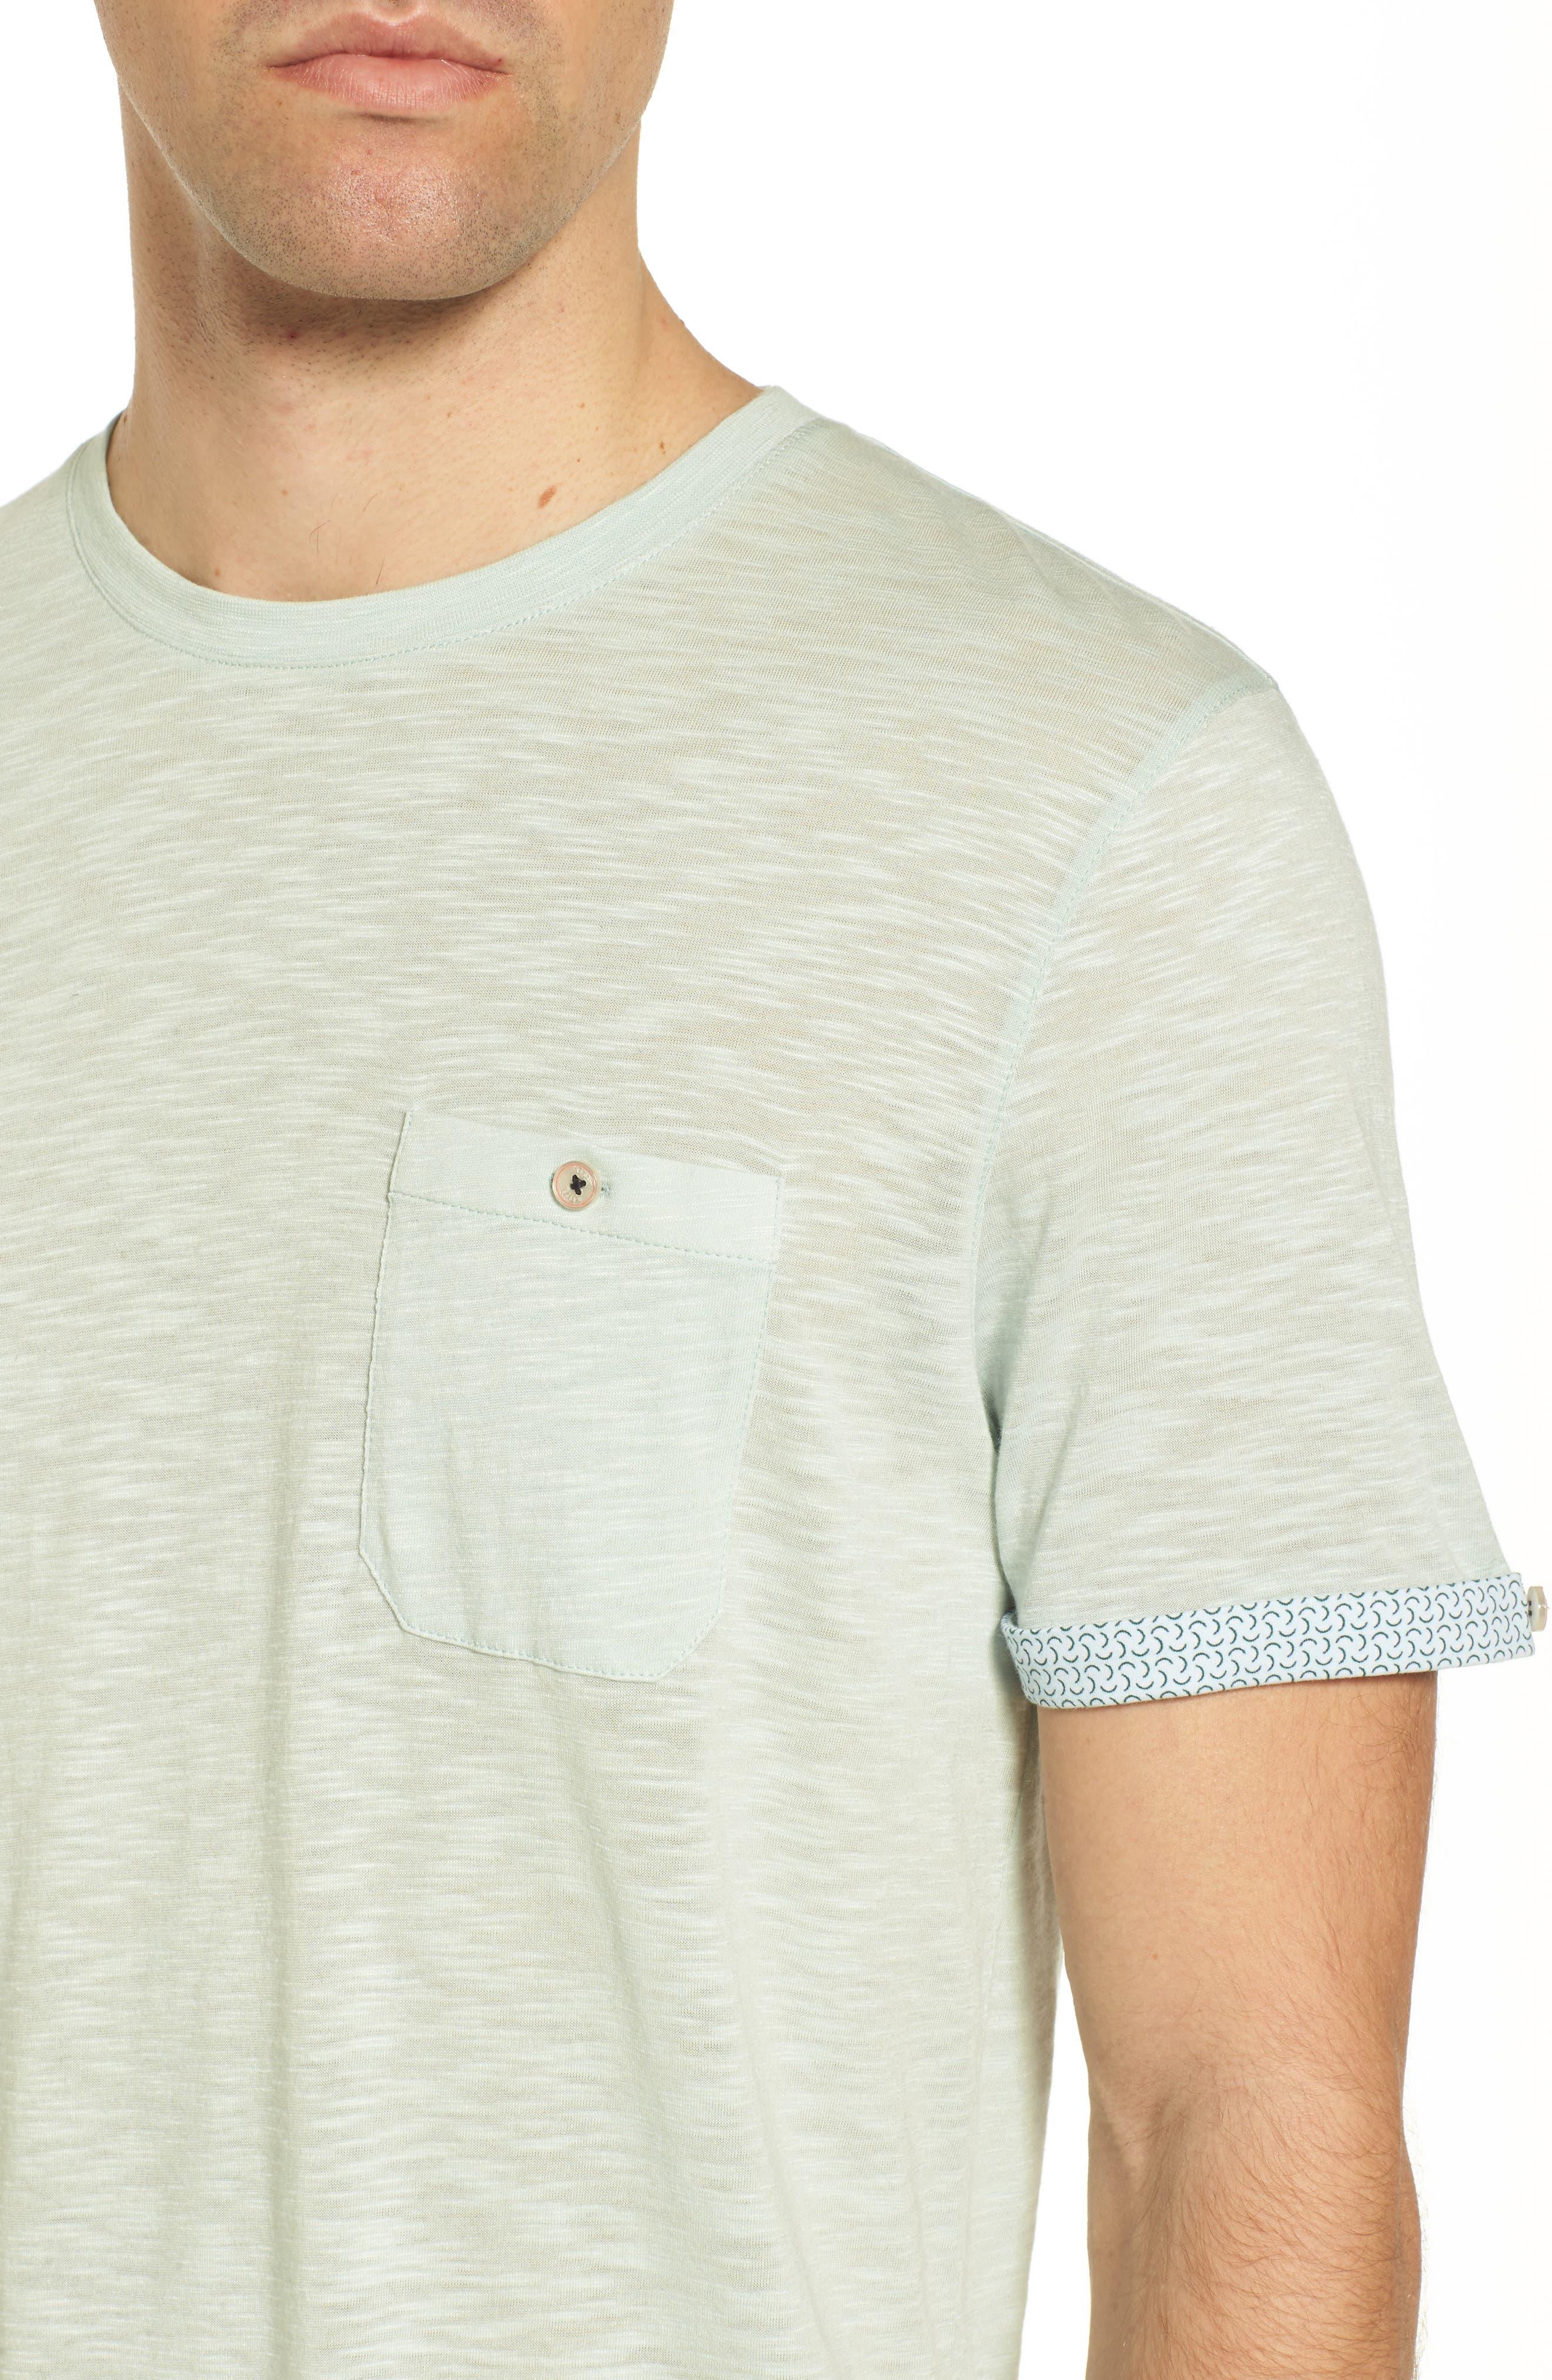 Alternate Image 4  - Ted Baker London Taxi Slub Cotton Pocket T-Shirt